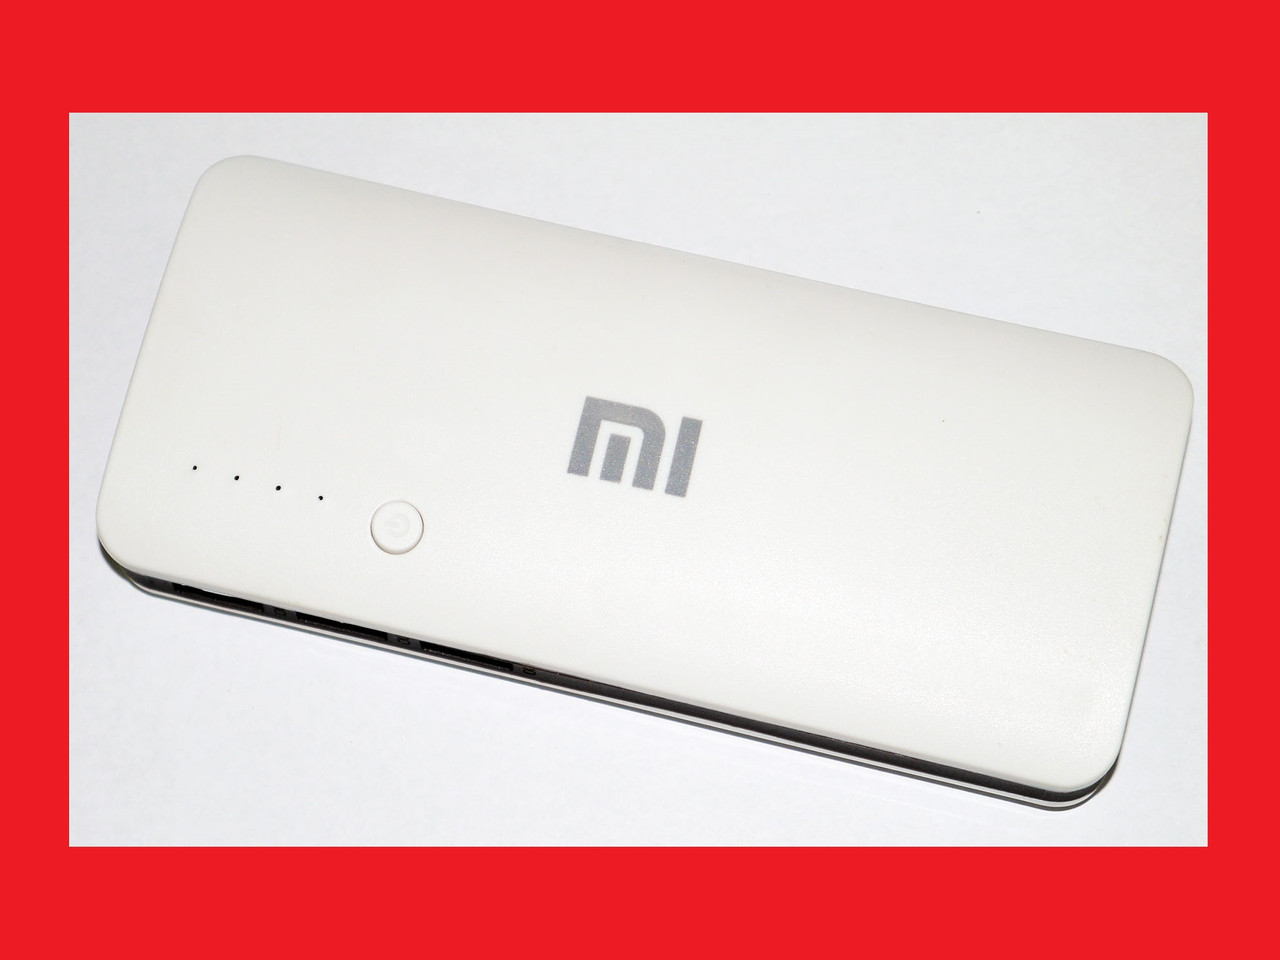 Power Bank Xiaomi Mi 30000 mAh Портативное зарядное